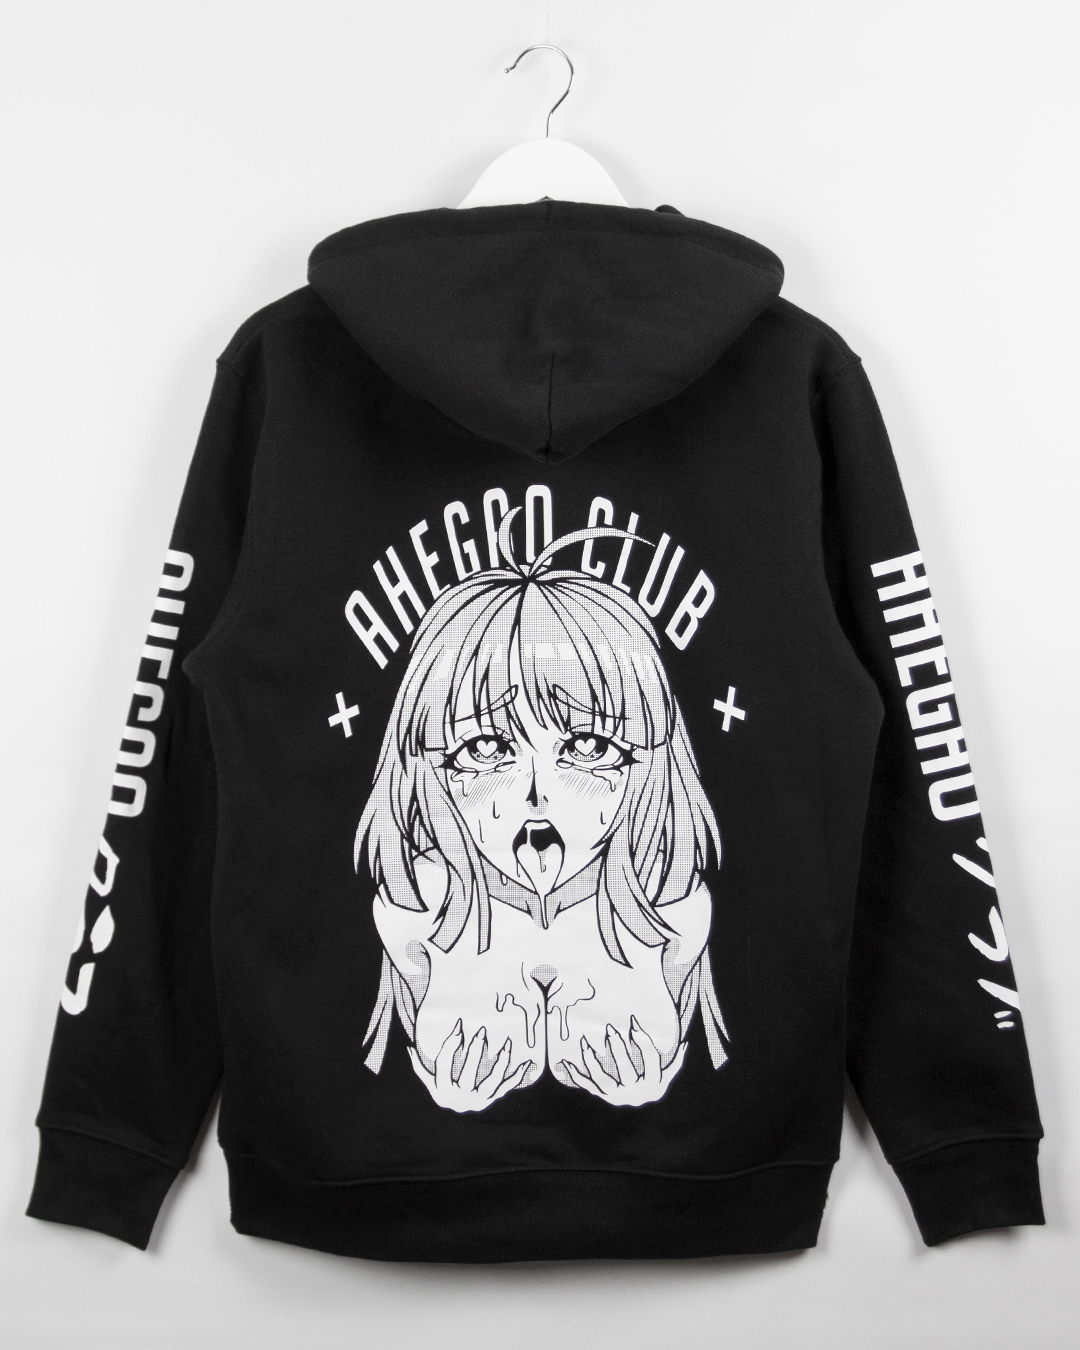 Ahega ahegao club hoodie